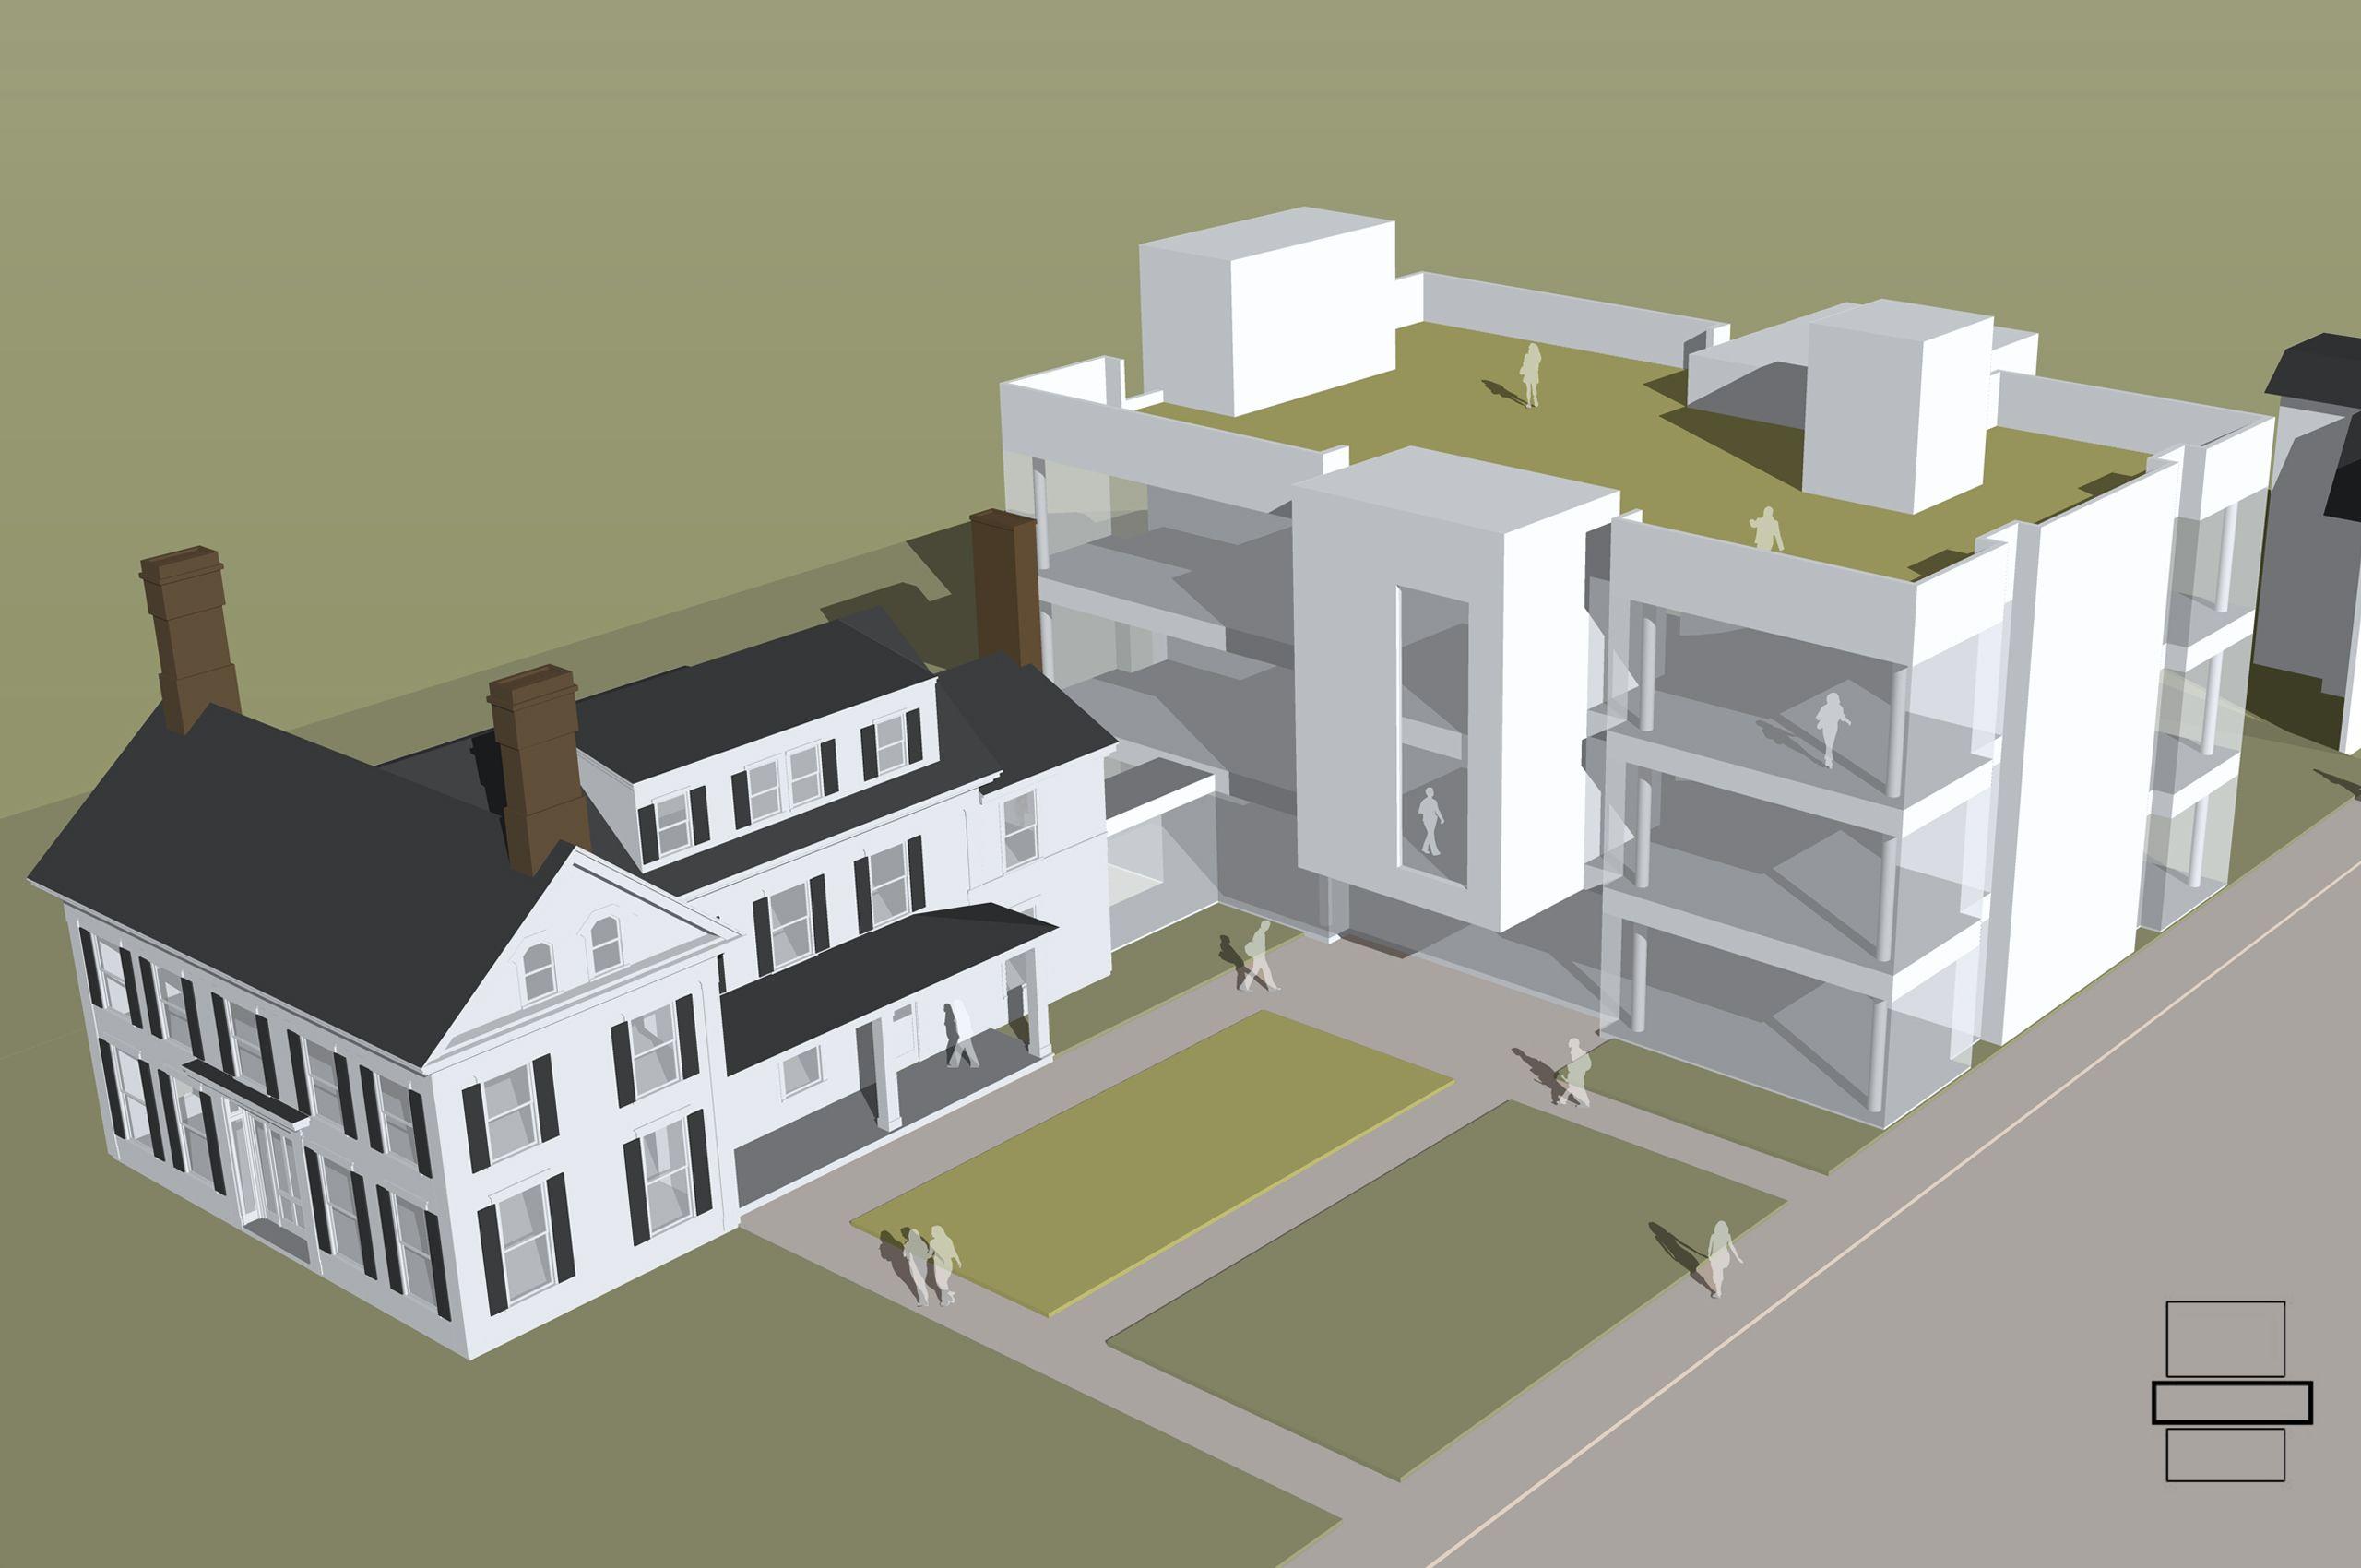 BowdoinCollege-Brunswick-ME-Scheme2-aerial-perspective.jpg